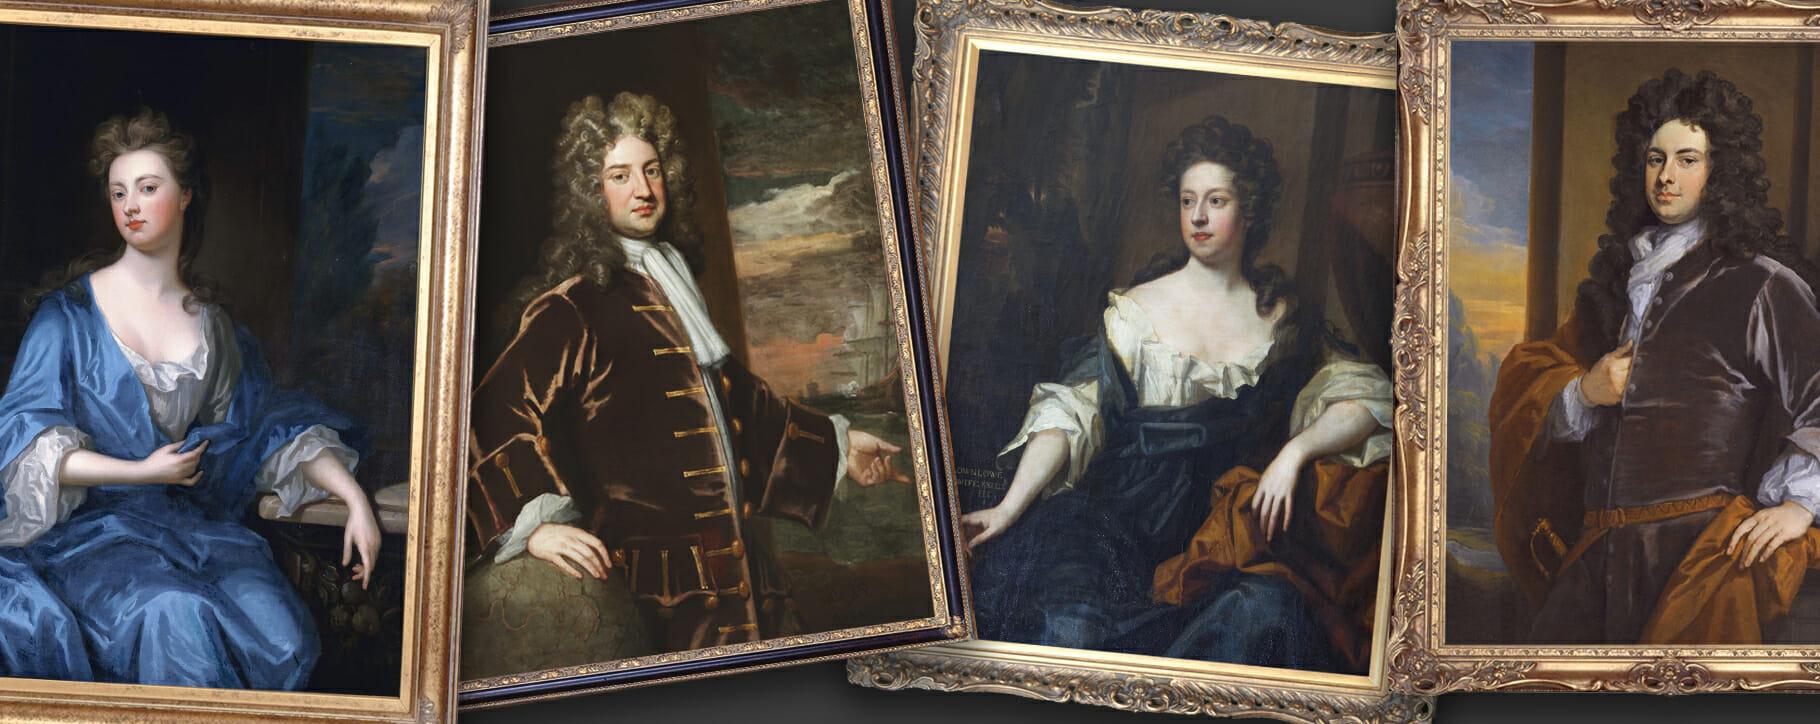 Godfrey Kneller Portraits